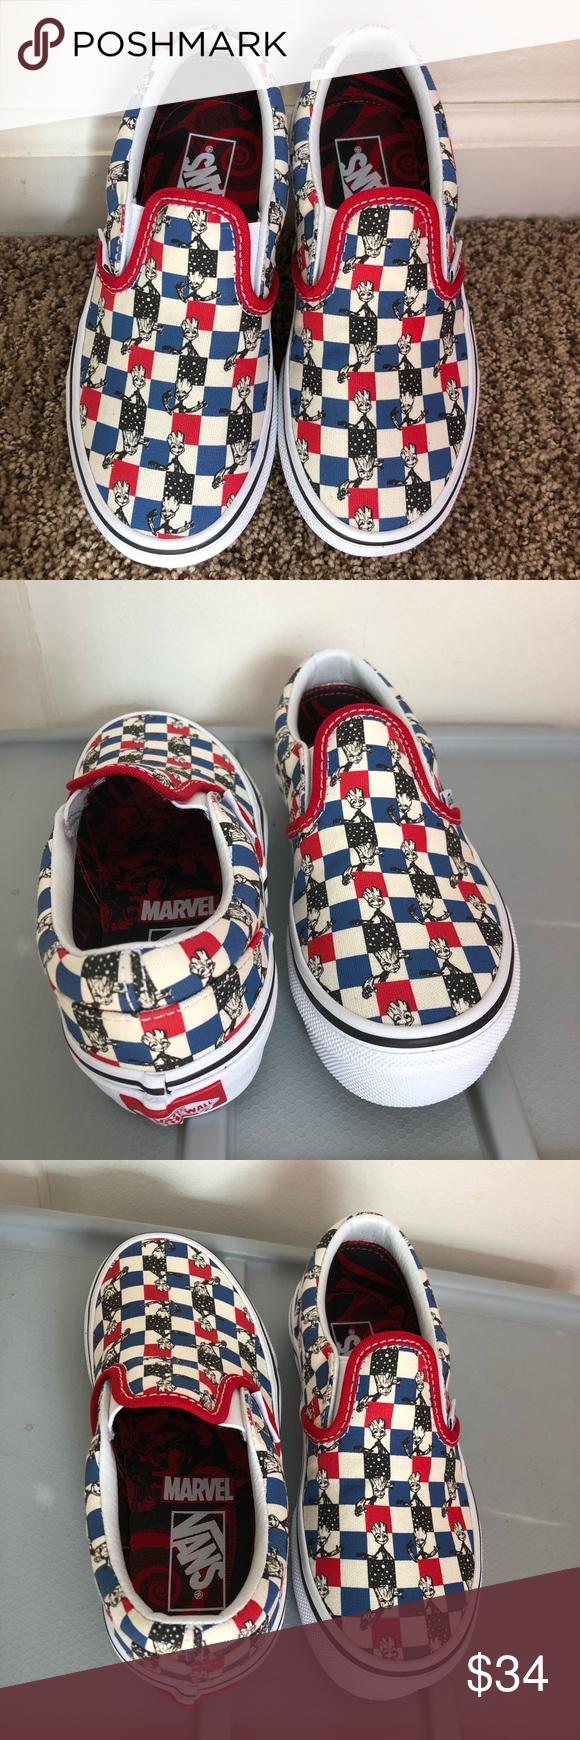 Vans x Marvel Slip On Groot Skate Shoes  Zumiez